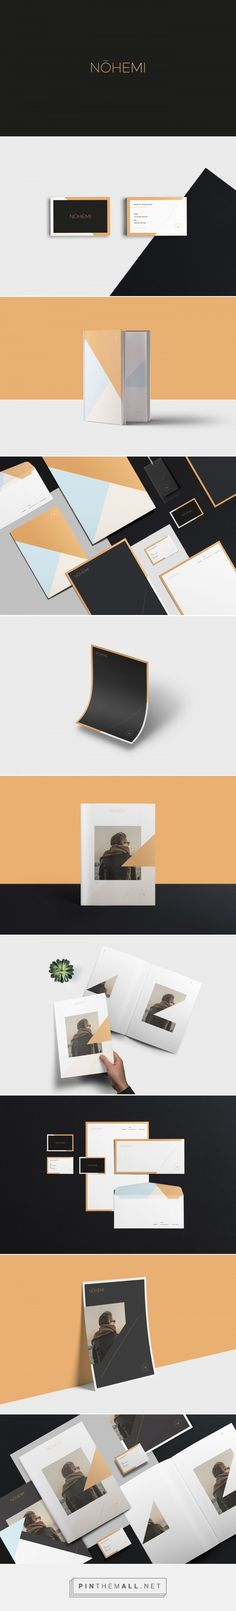 Nohemi Fashion Retail Branding by Przemek Bizon   Fivestar Branding Agency – Design and Branding Agency & Curated Inspiration Gallery